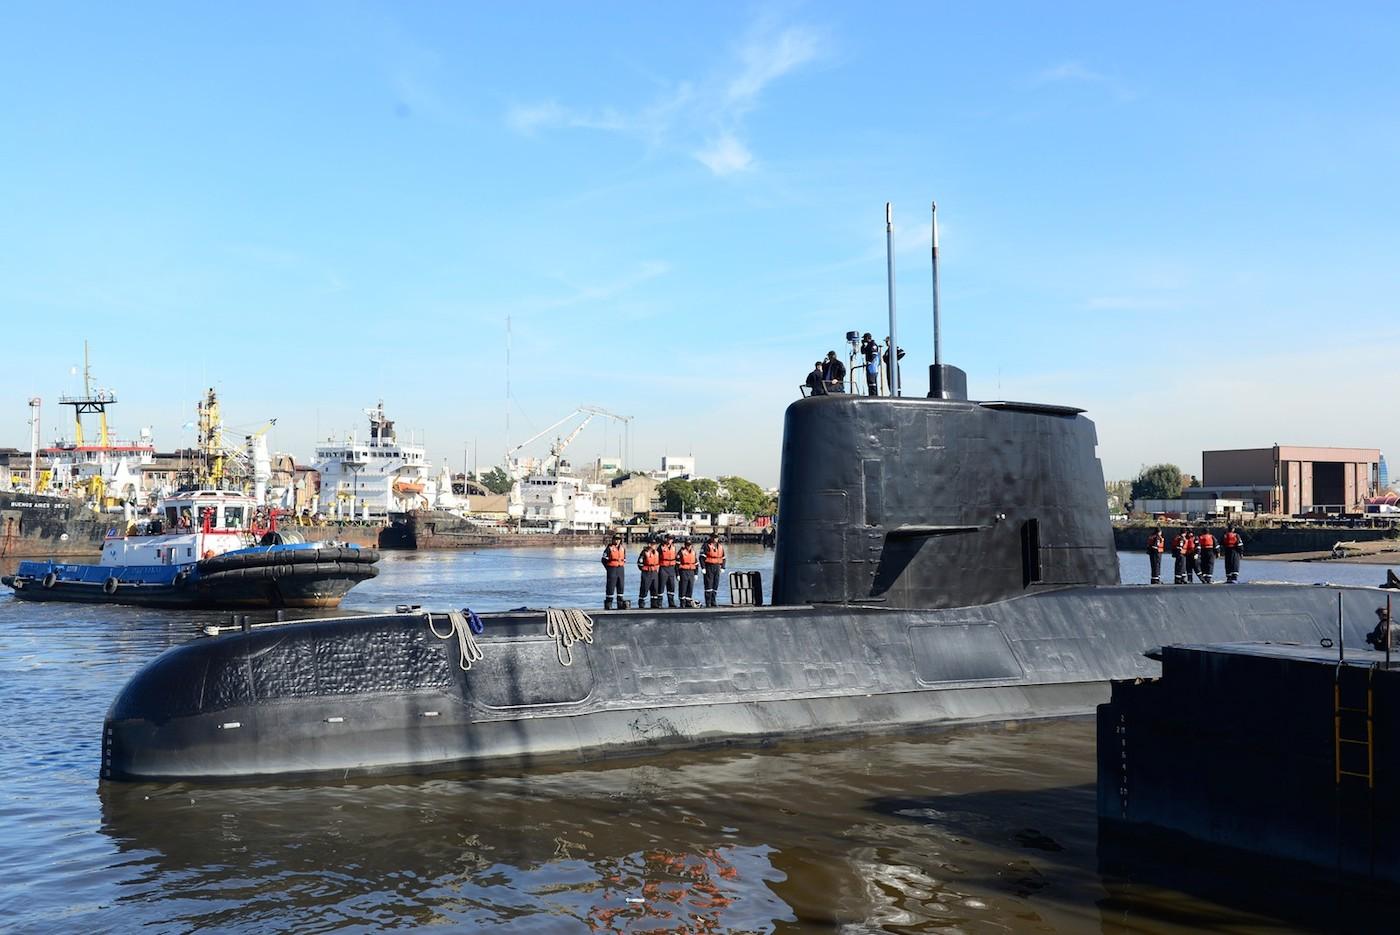 322548507f7 Marinha argentina culpada pela tragédia do ARA San Juan - ZAP